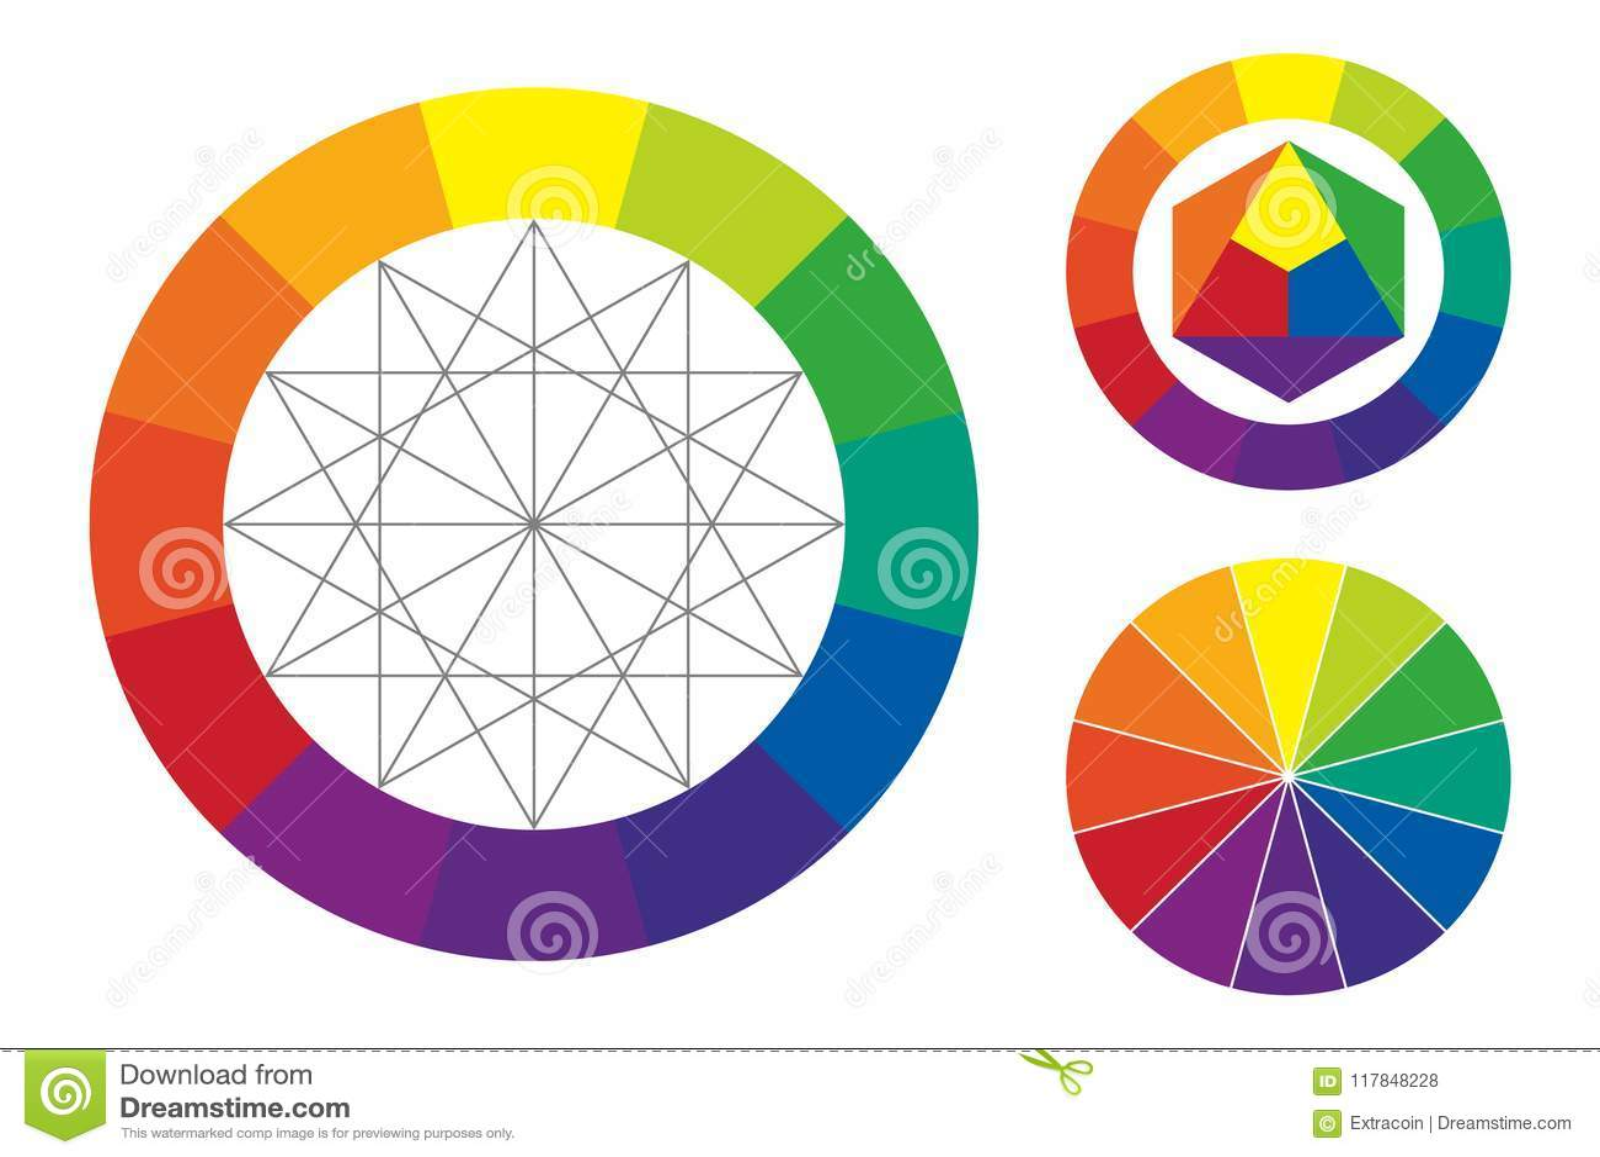 Color Wheel Vector Illustration Stock Vector Illustration Of